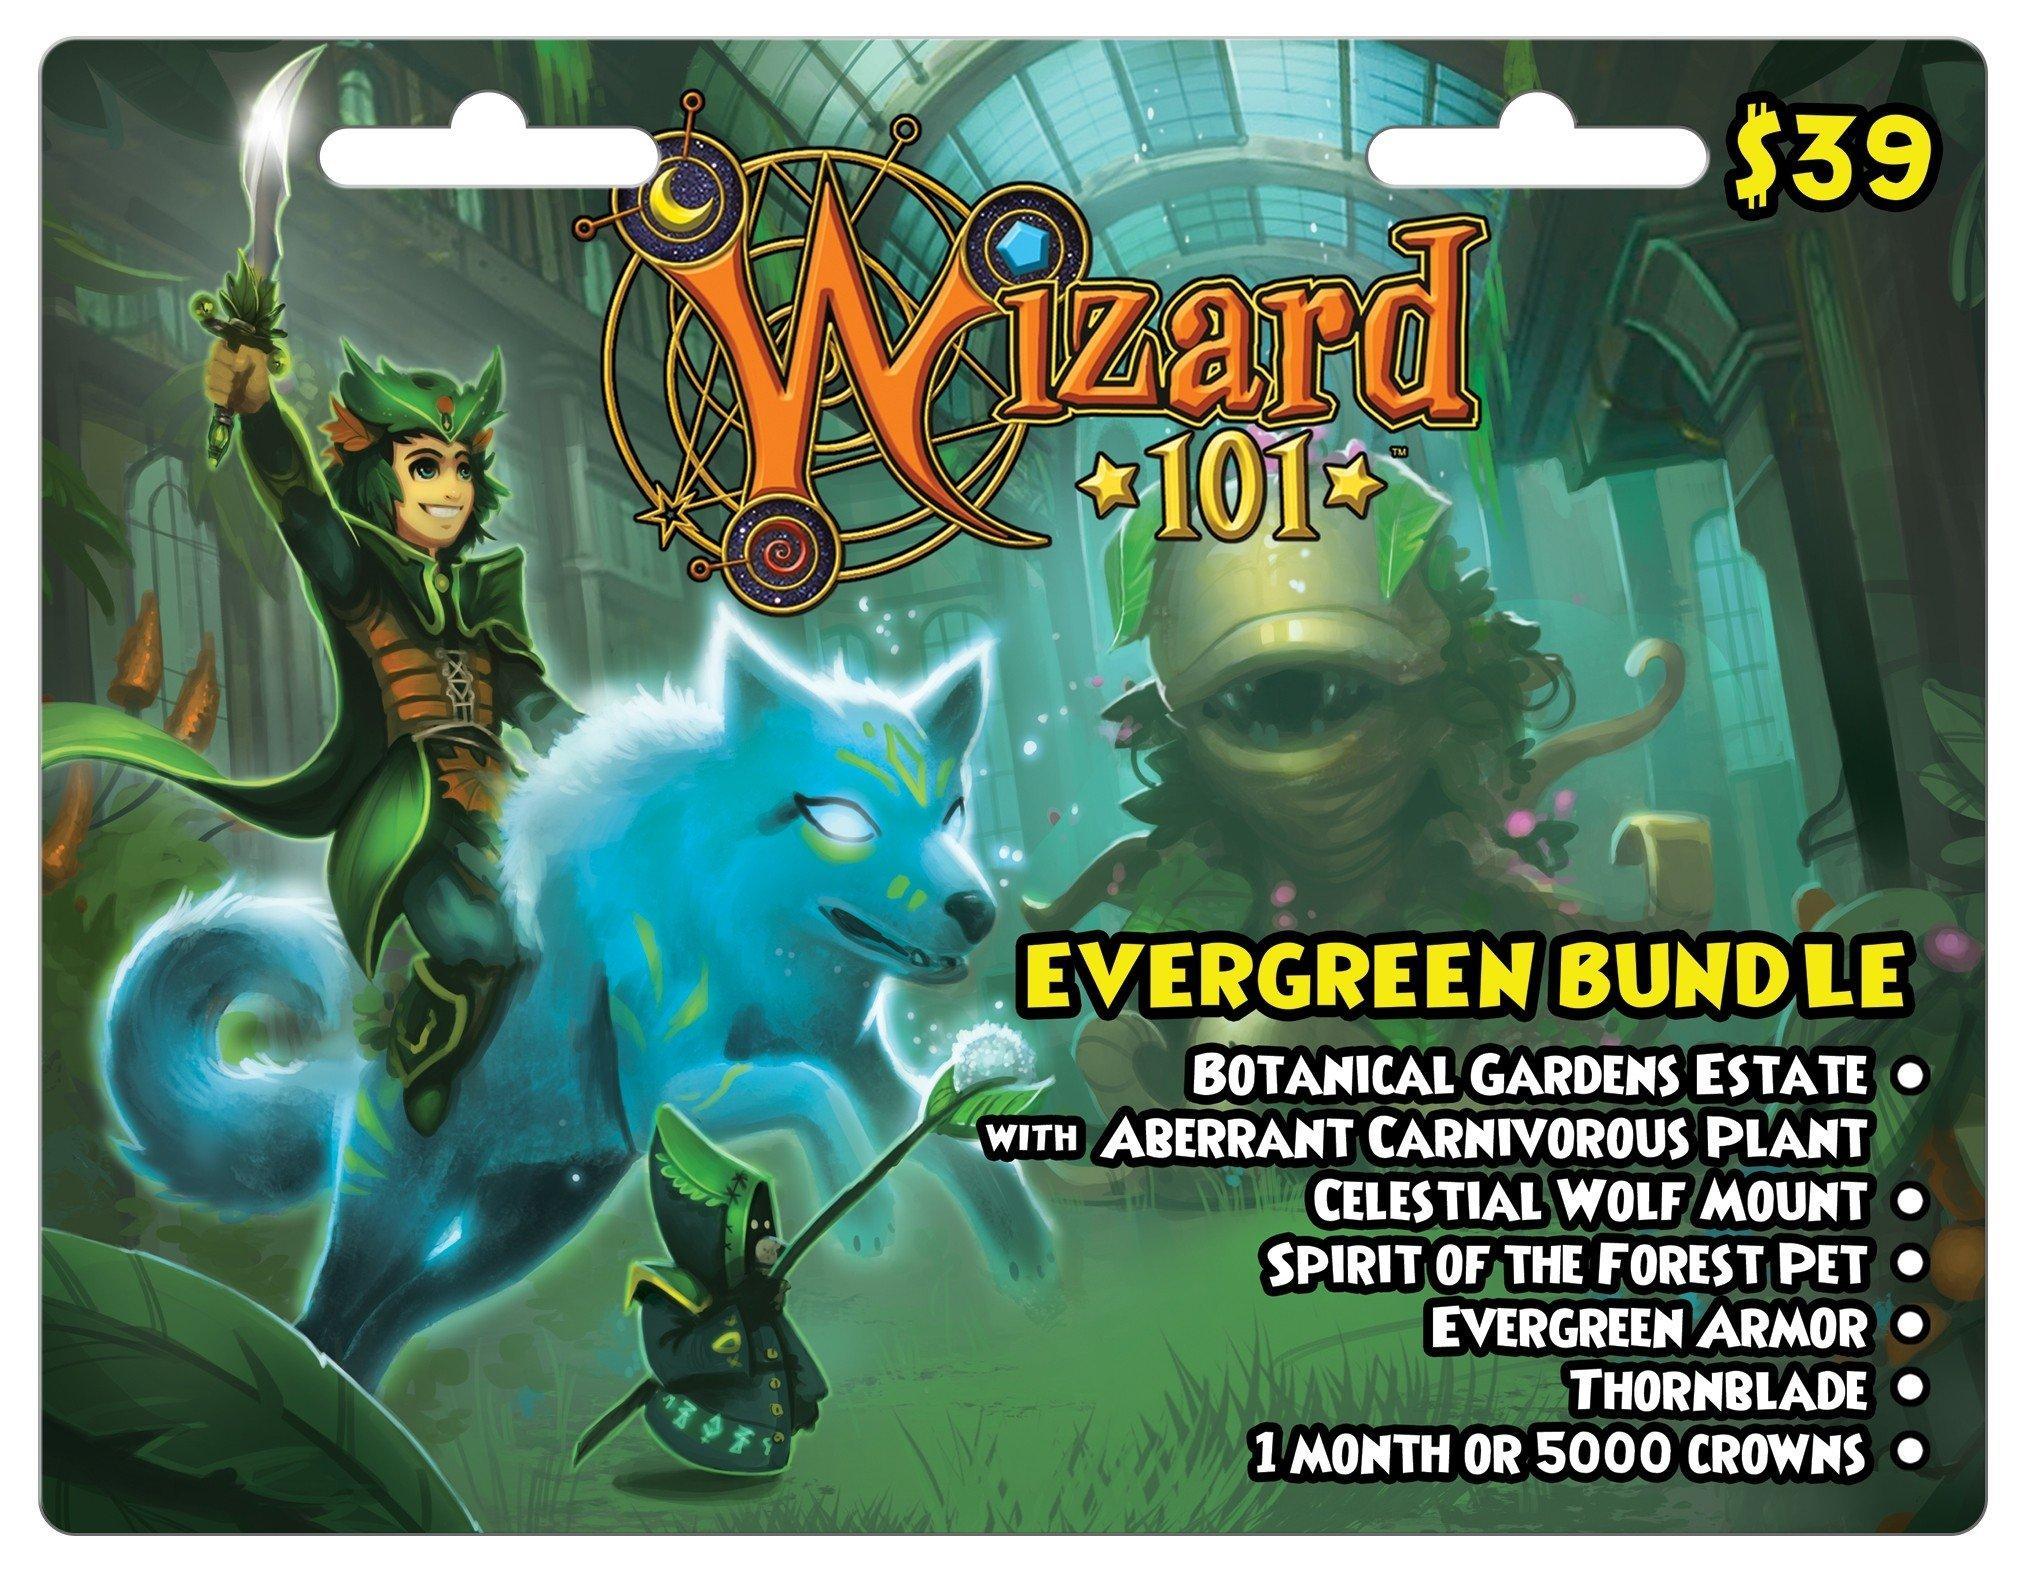 Wizard 101 $39 - Evergreen Bundle | <%Console%> | GameStop